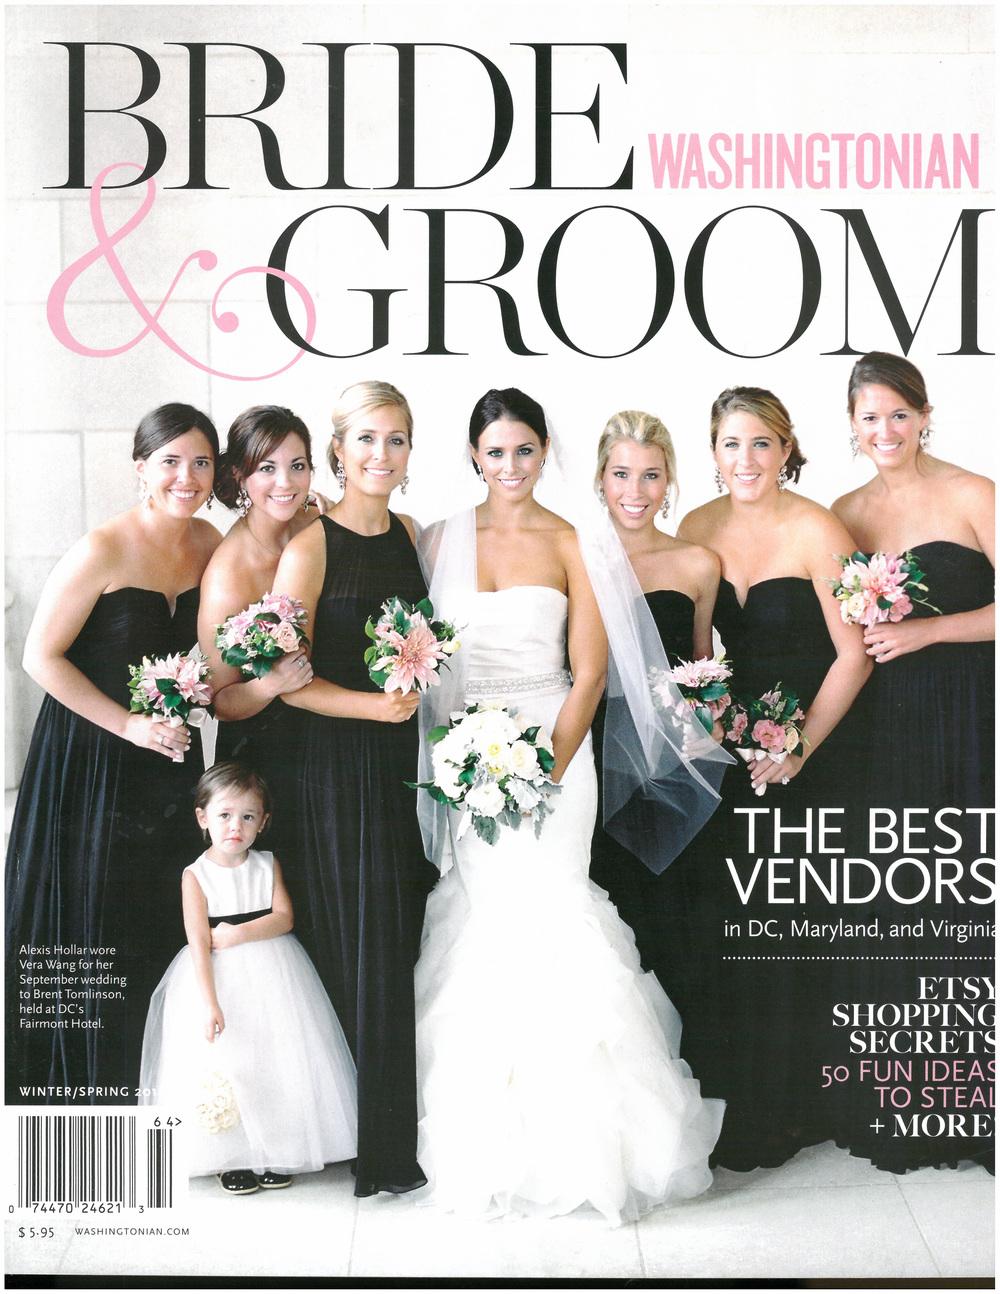 Washingtonian Bride & Groom Cover Winter : Spring 2016.jpg